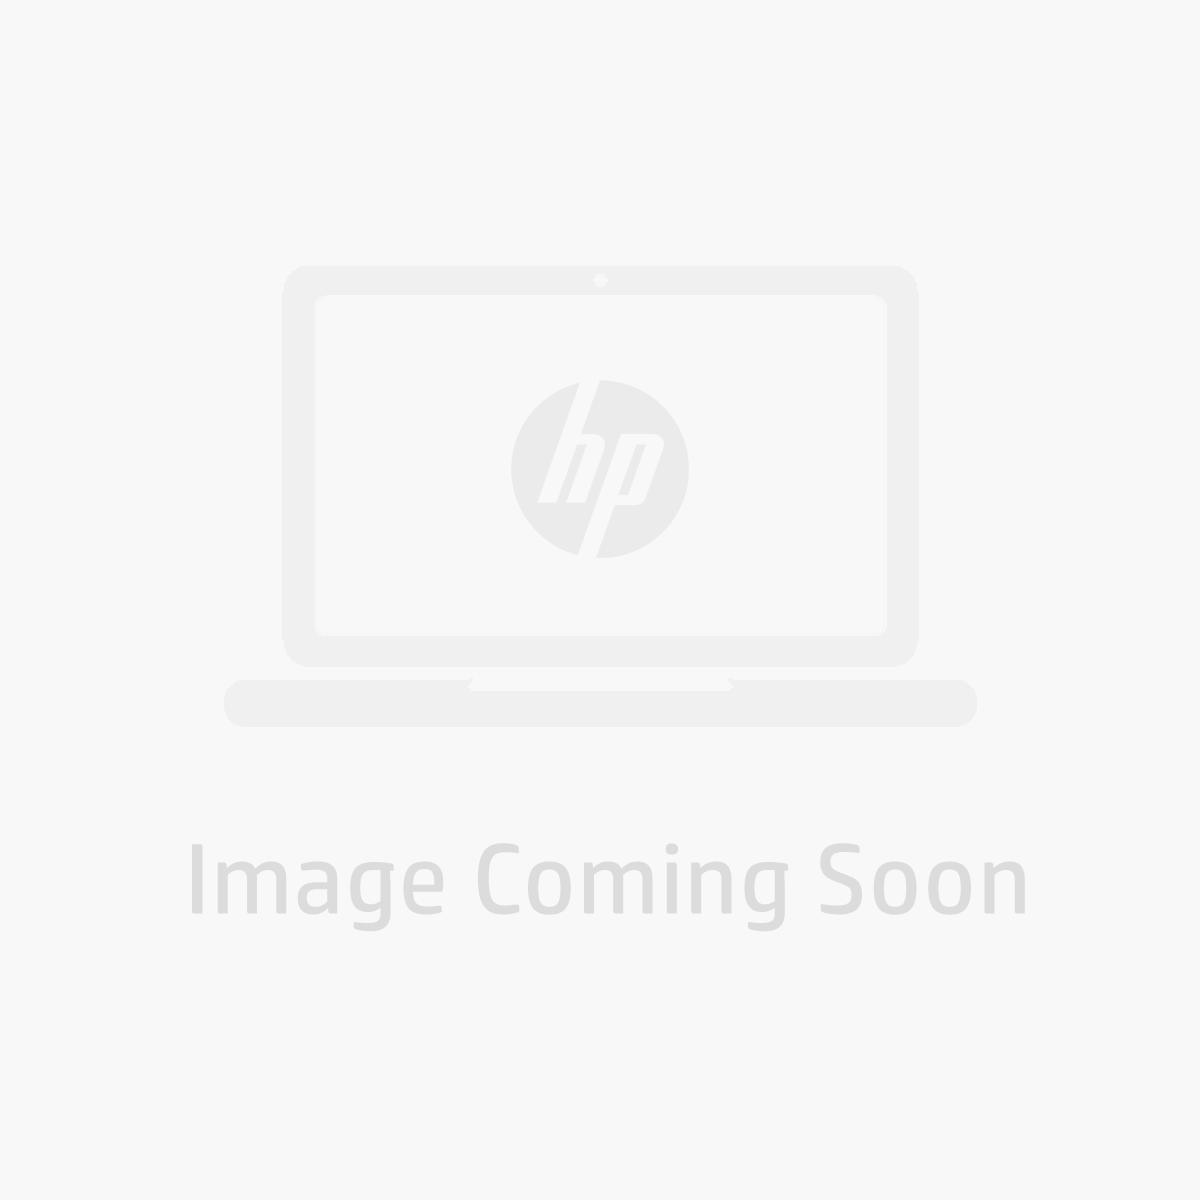 HP Pavilion Gaming Desktop Ryzen 7-2700 with NVIDIA® GeForce® GTX 1060